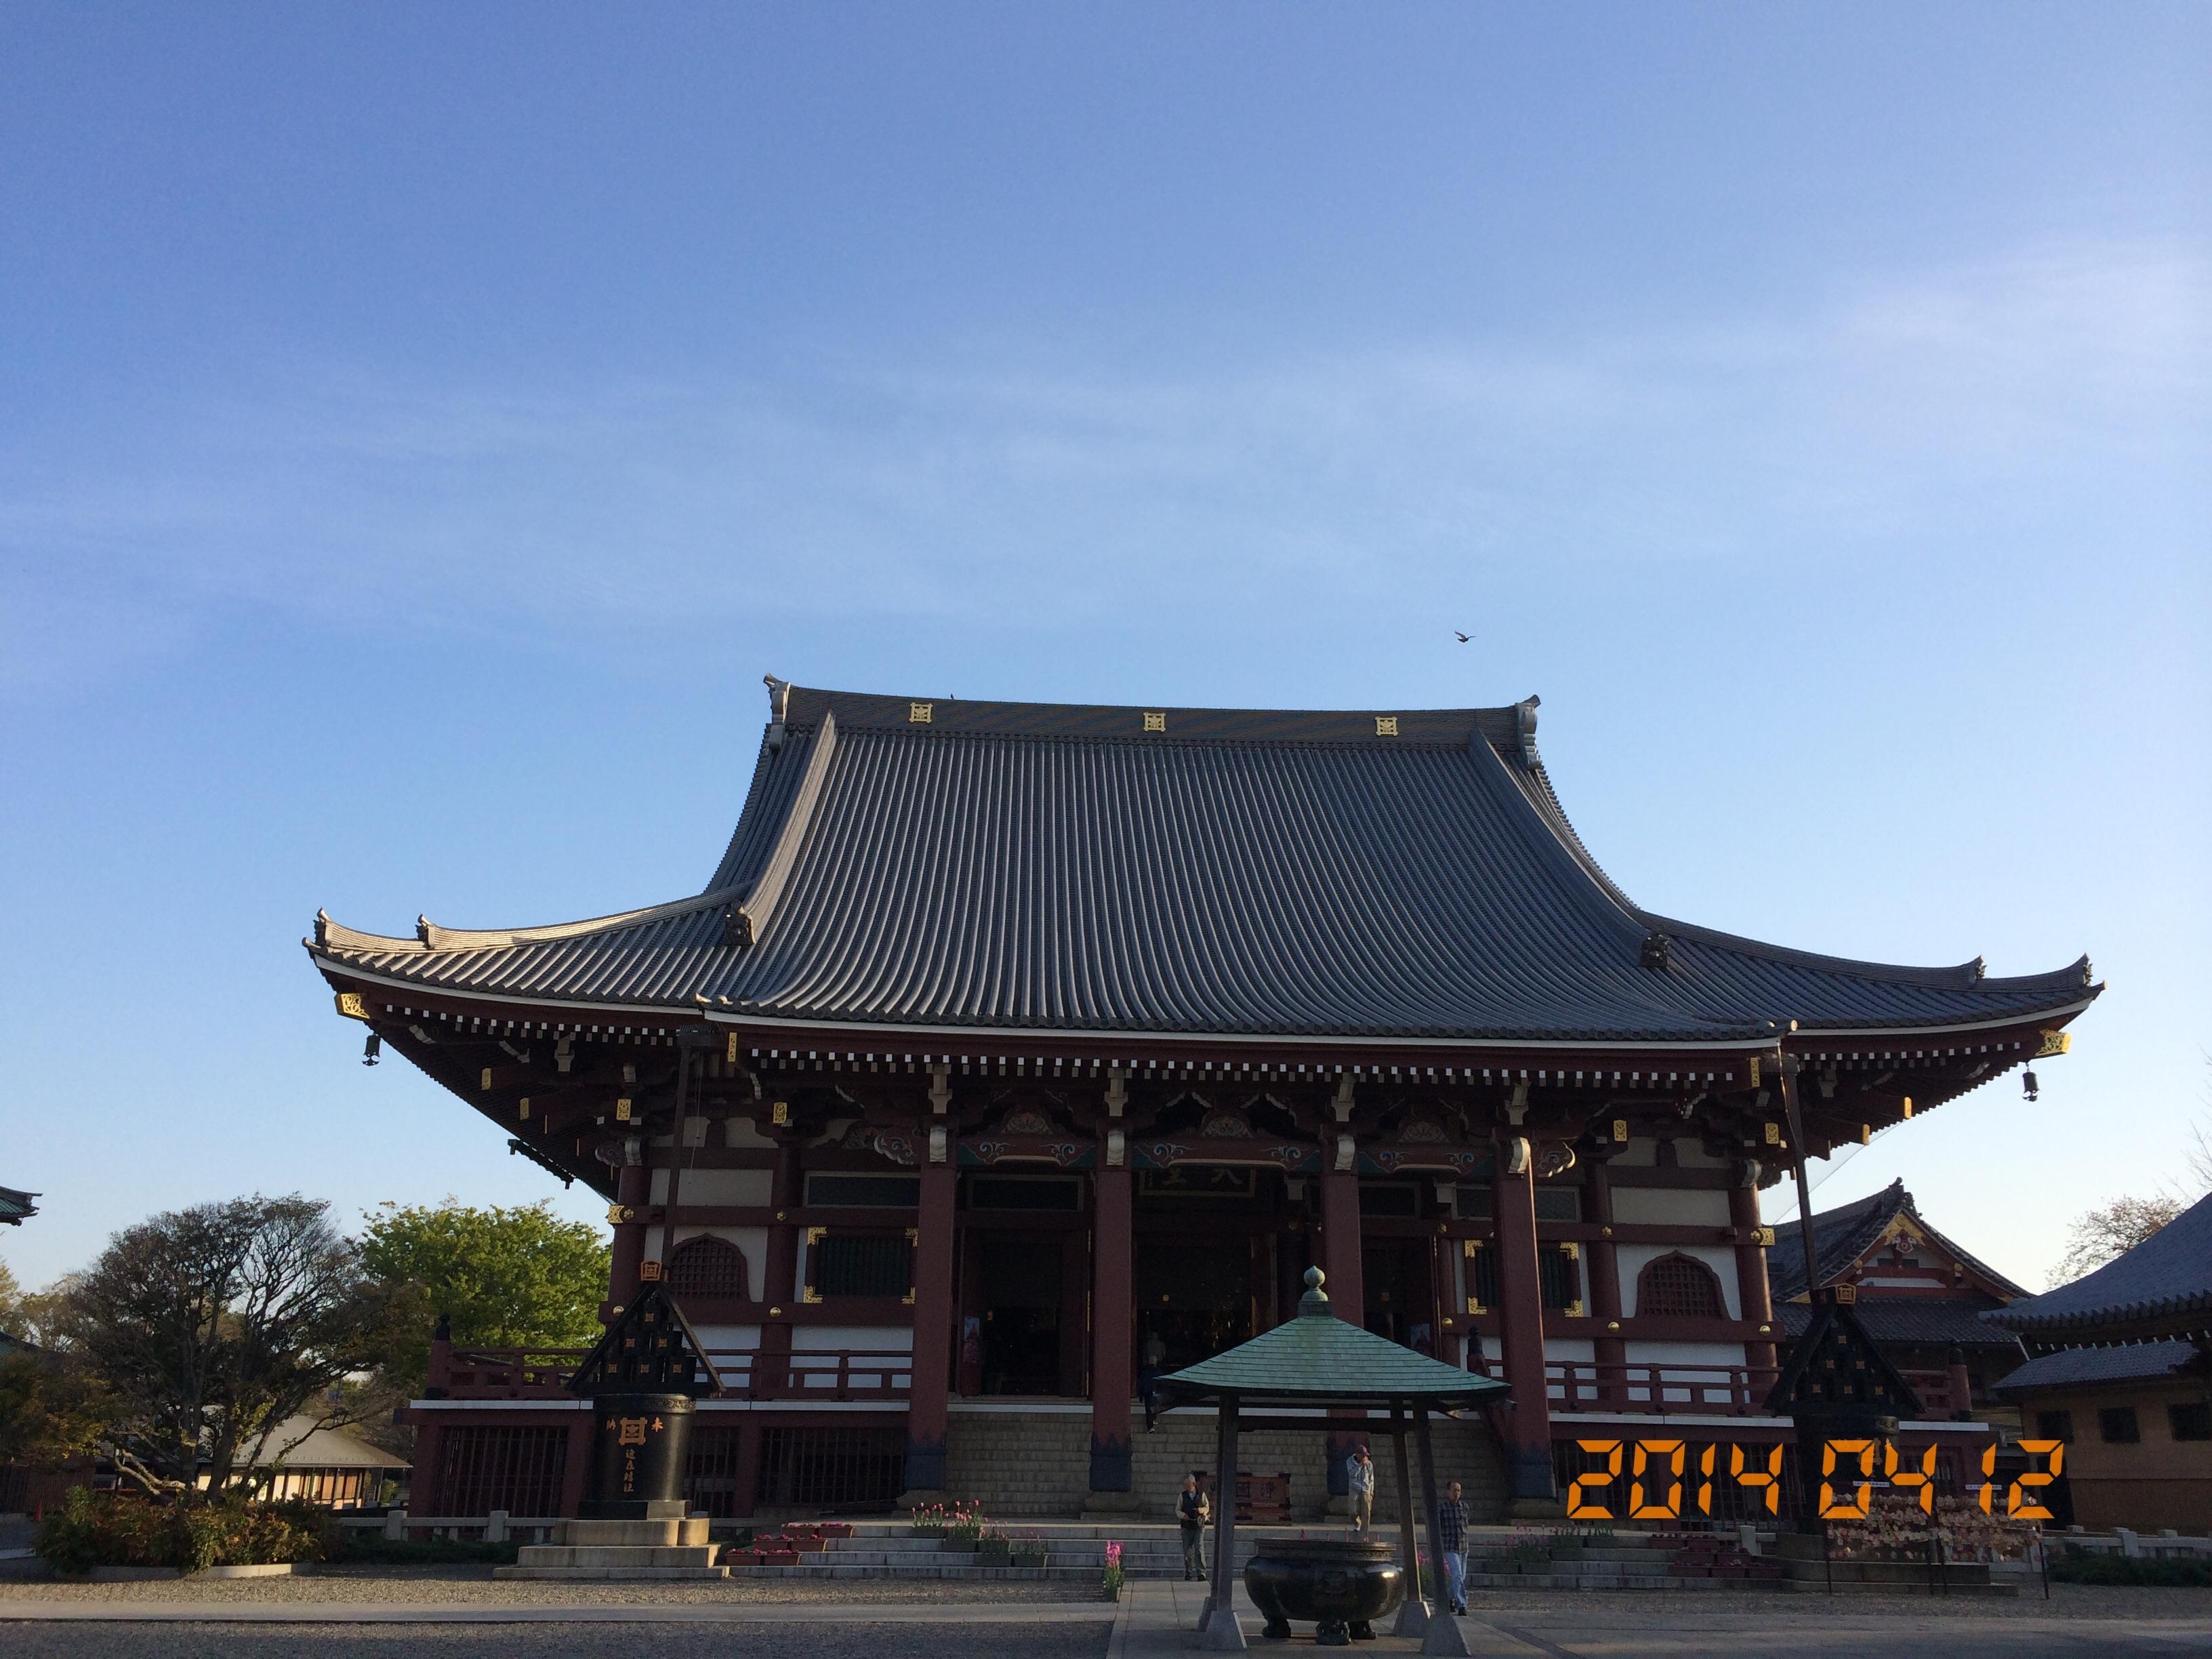 2014年4月12日朝の池上本門寺